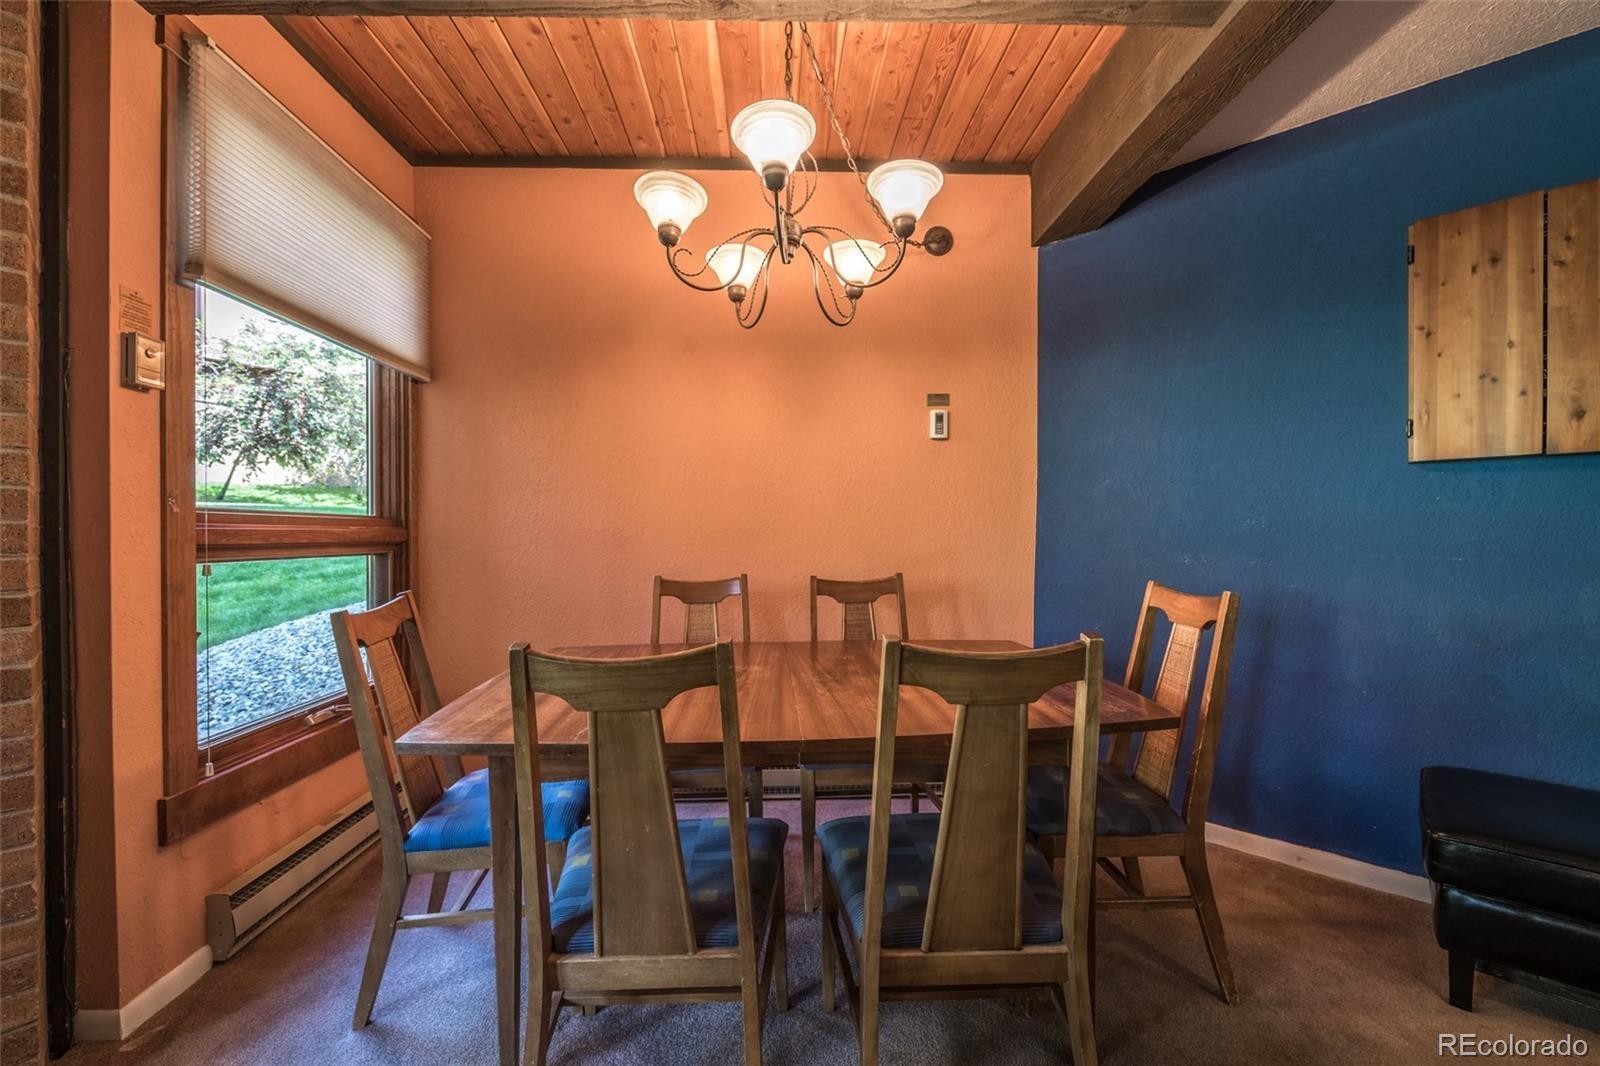 MLS# 6498865 - 13 - 2700 Village Drive #105, Steamboat Springs, CO 80487